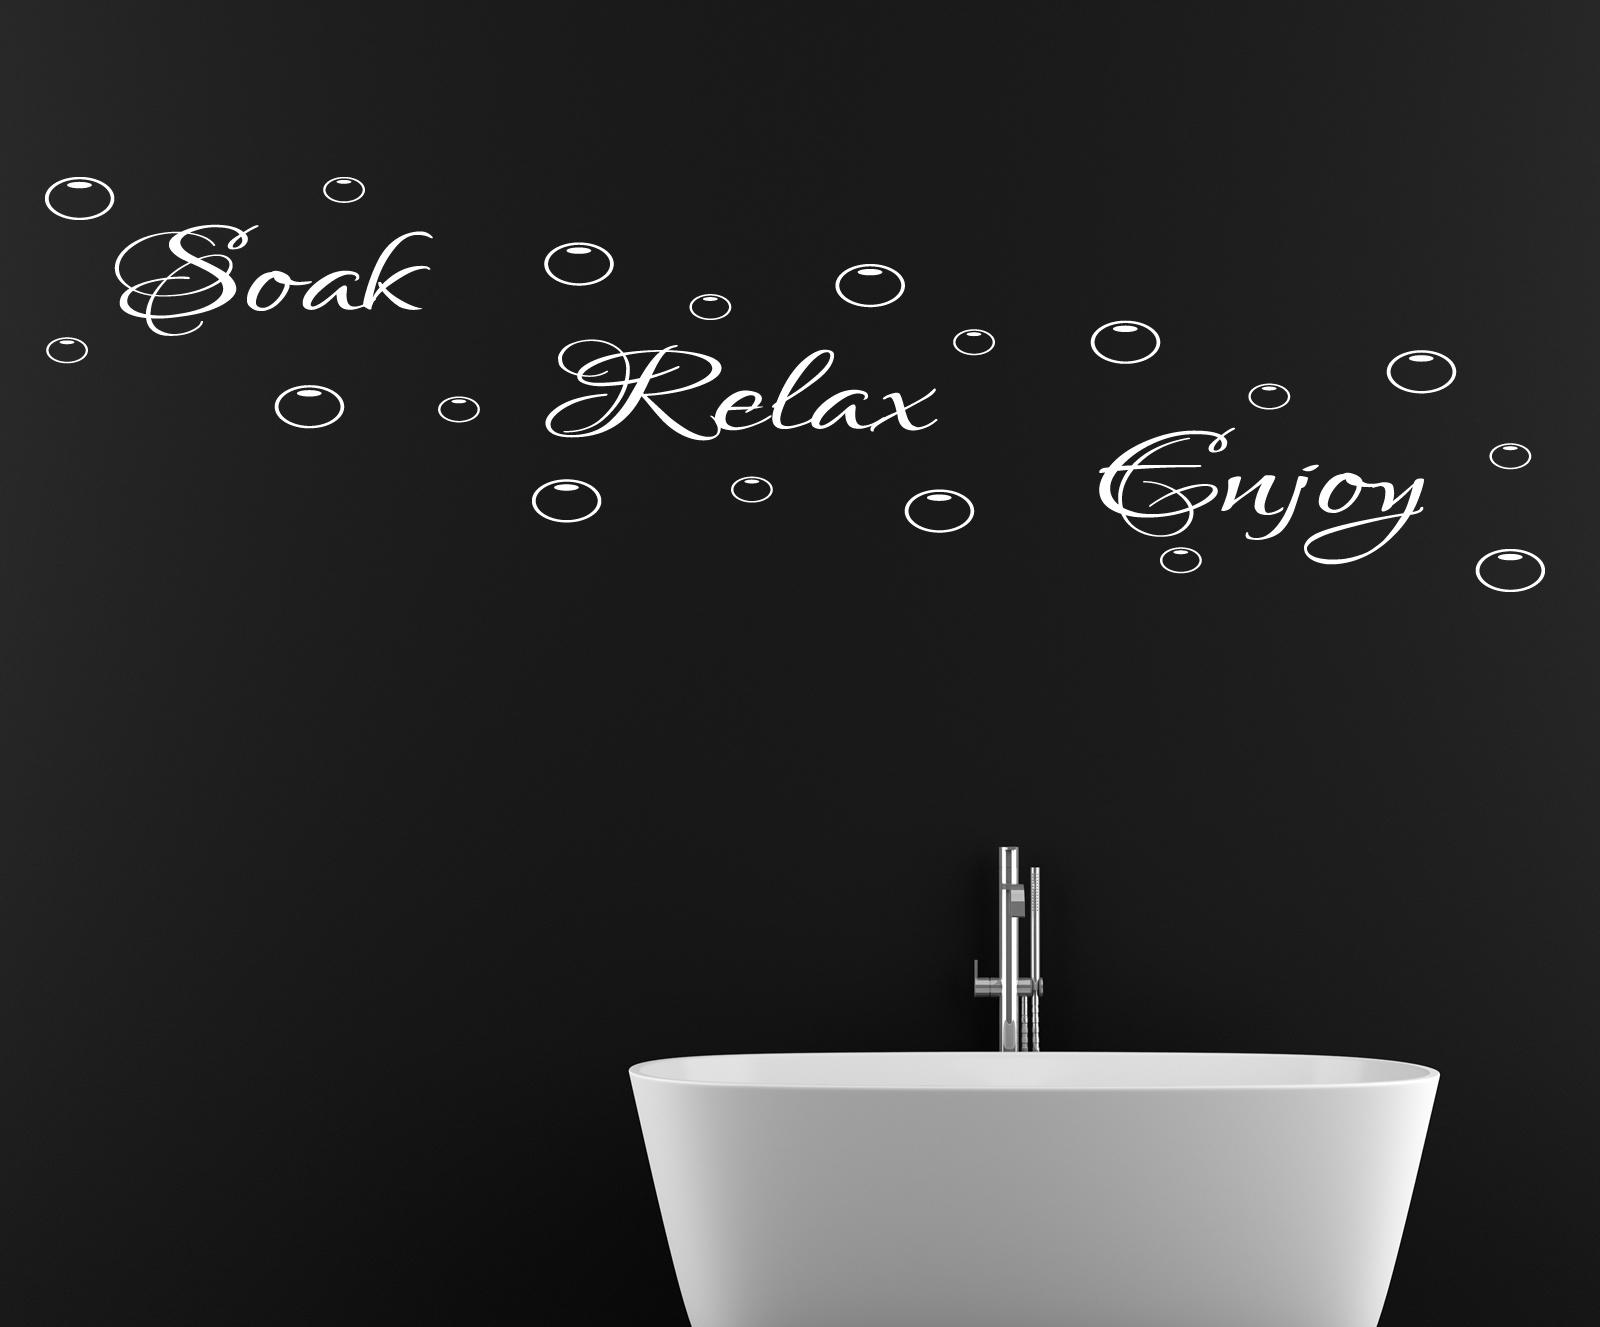 Soak Relax Enjoy Wall Sticker Quote Bathroom Shower Wall Art Decal